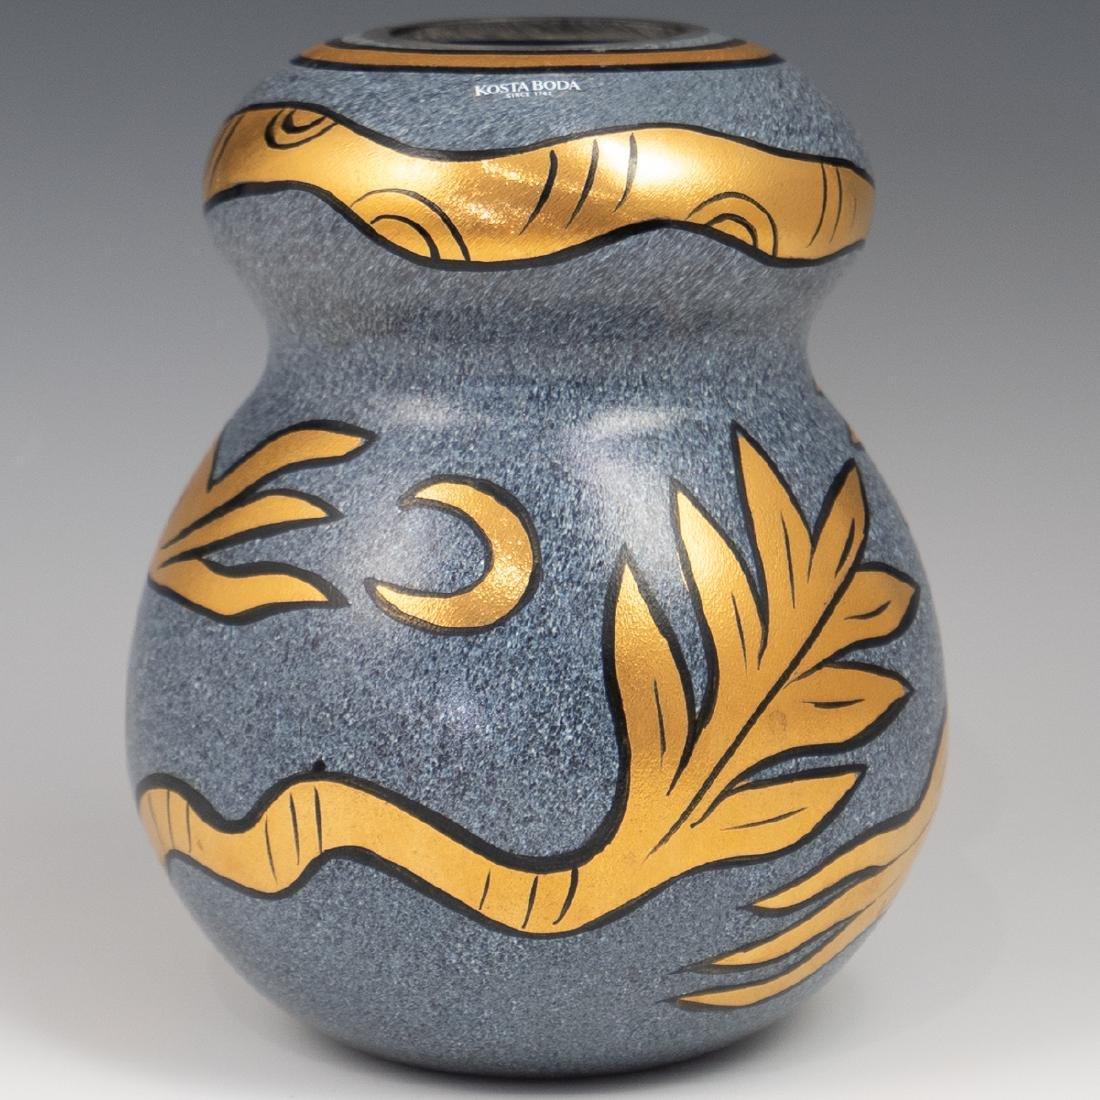 Kosta Boda Double Guard Crystal Vase